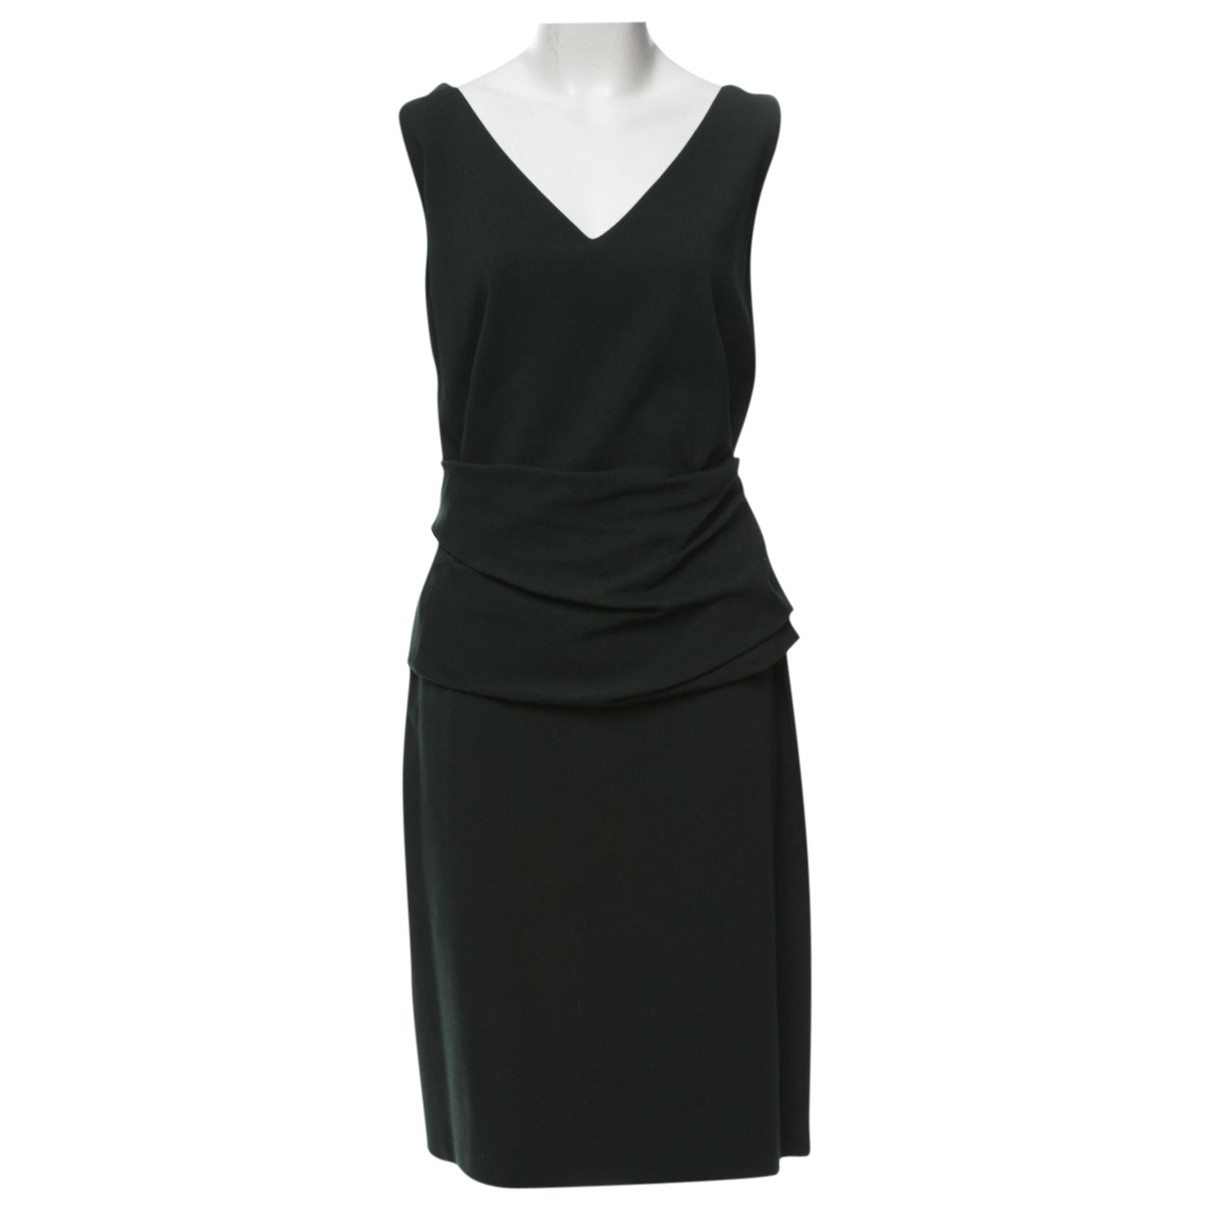 Akris Punto \N Green dress for Women 44 FR